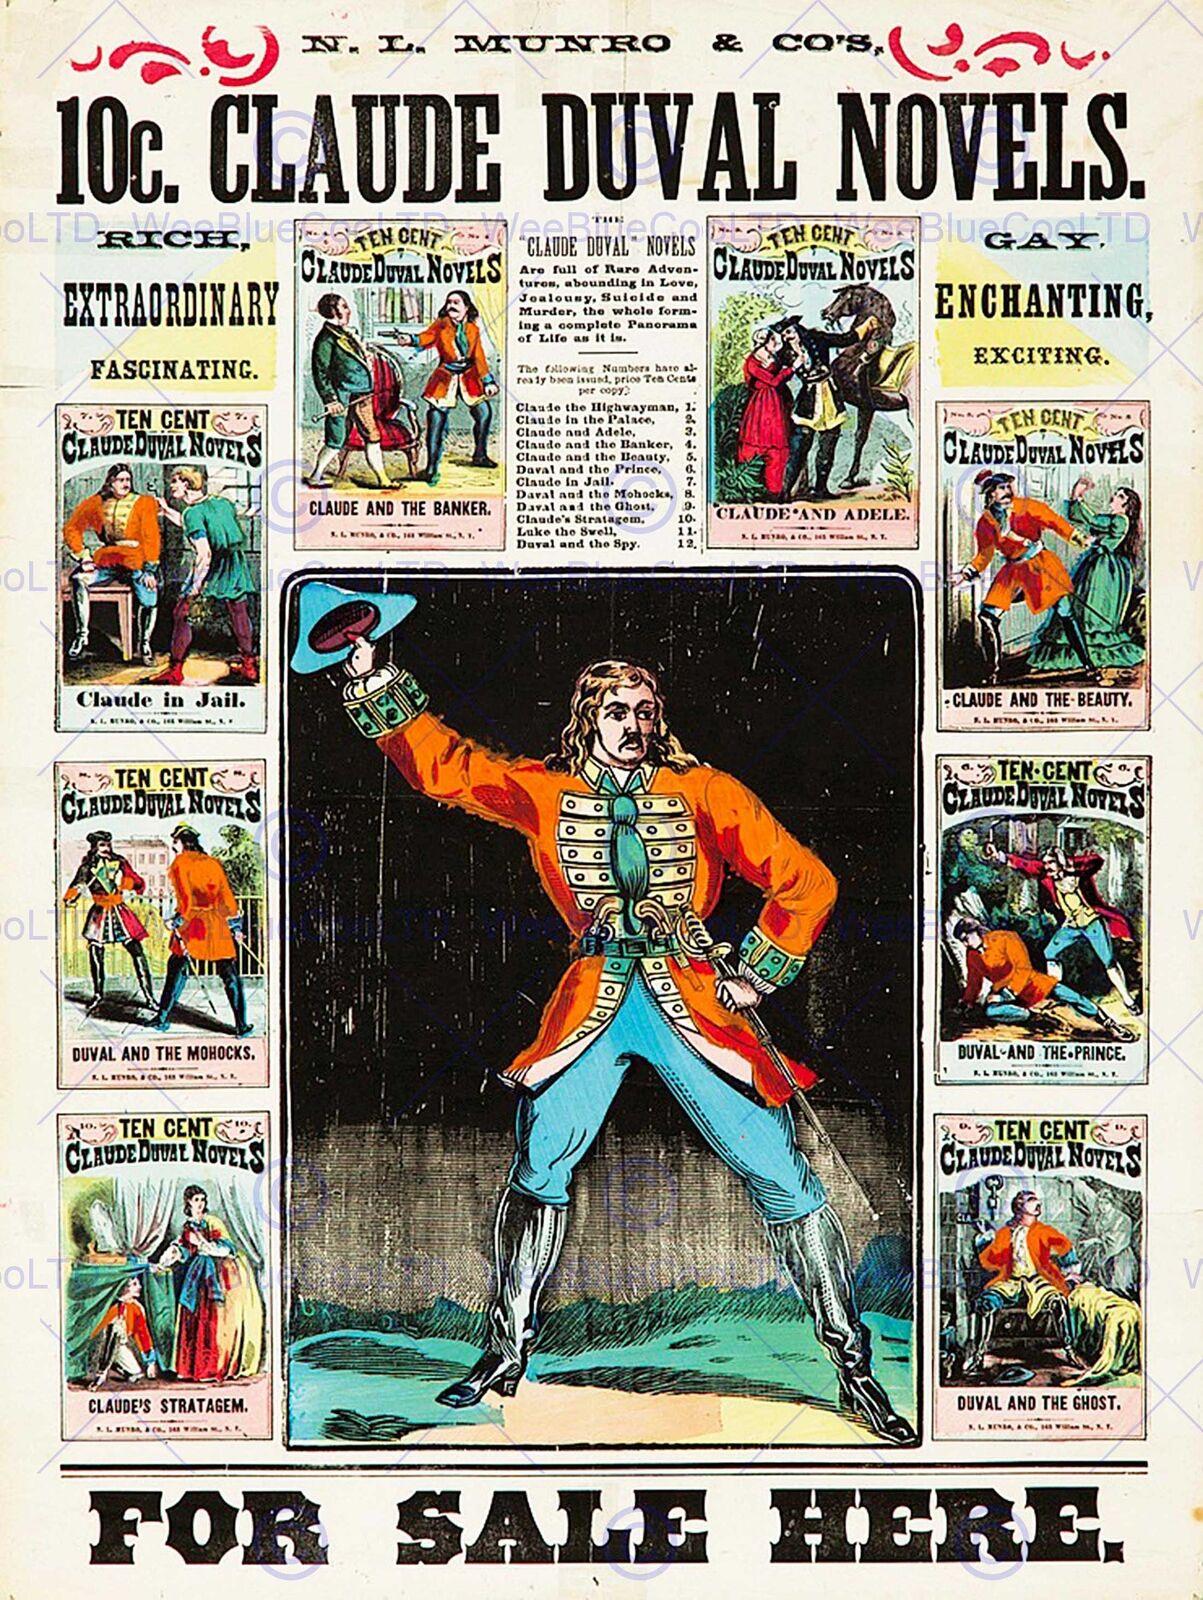 ADVERT MAGAZINE CLAUDE DUVAL FRENCH HIGHWAYMAN CELEBRITY LONDON POSTERBB7929B